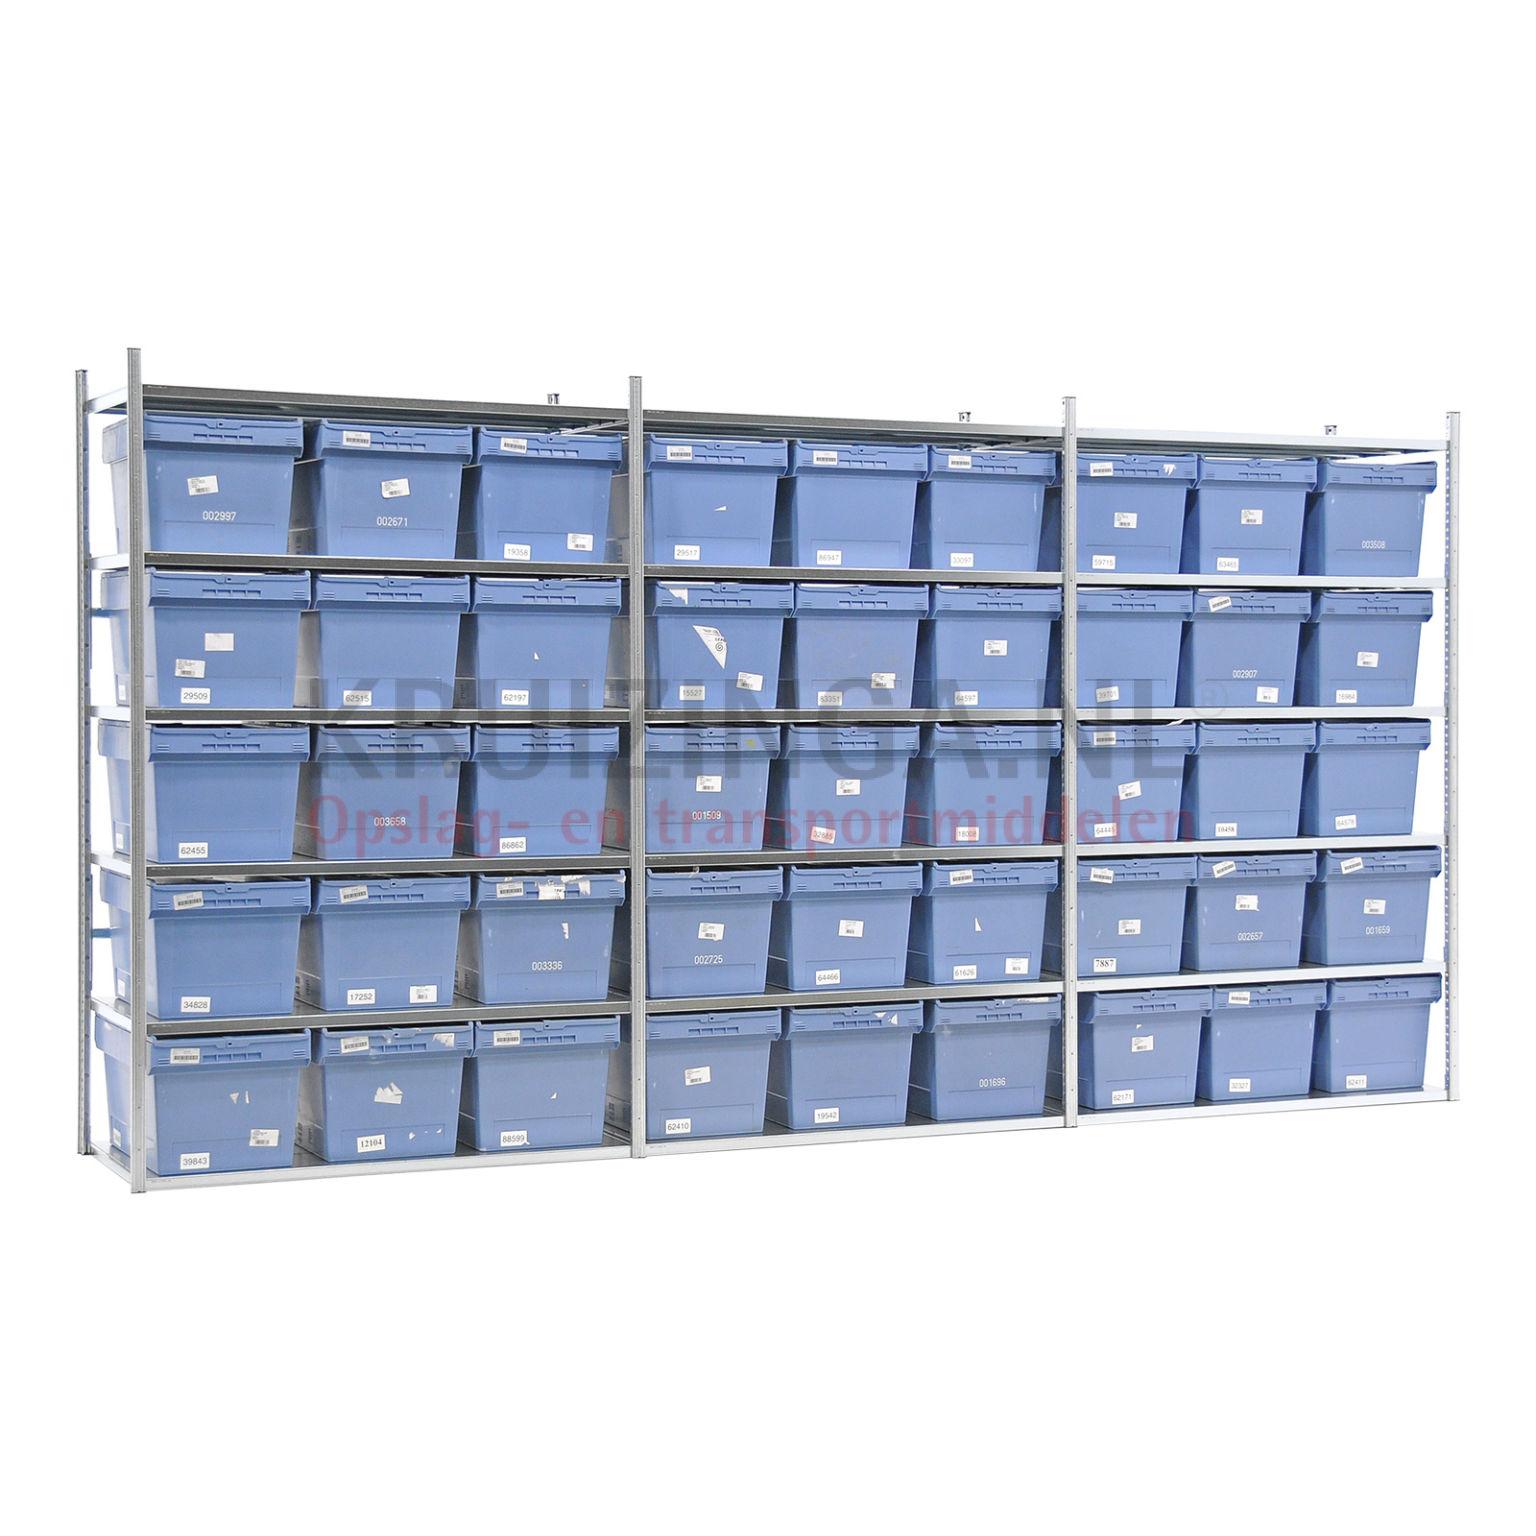 kombination satz regale kombination satz fachbodenregal inkl 45 stapelboxen mit deckel. Black Bedroom Furniture Sets. Home Design Ideas